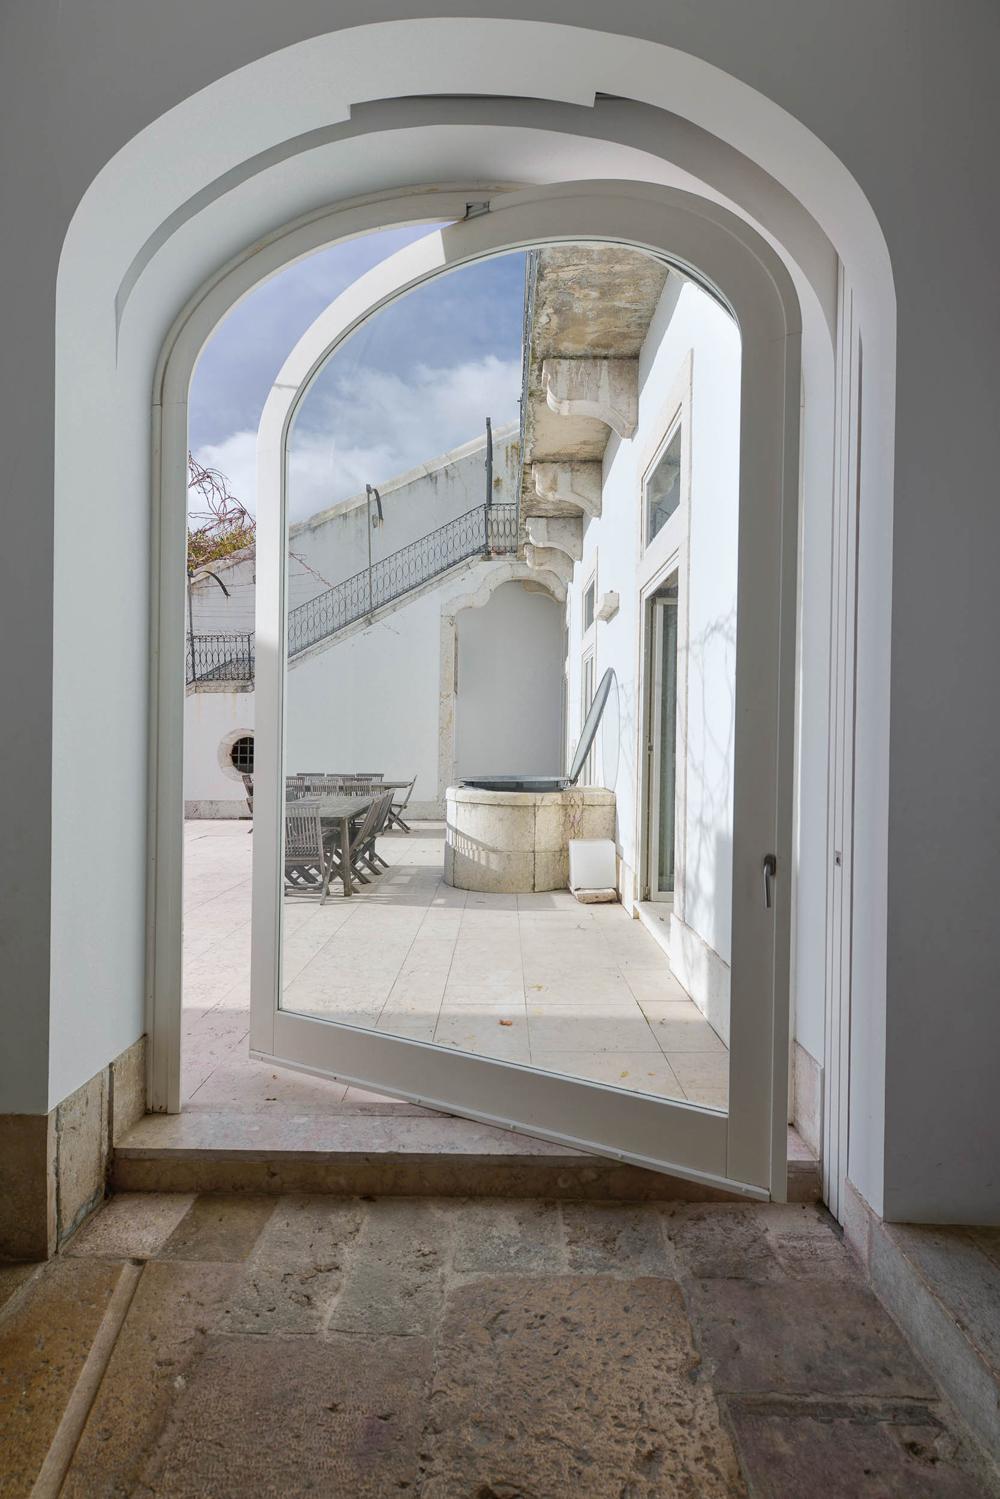 8.Oracle-Fox-Sunday-Sanctuary-Industrial-Interior-Concrete-Wood-Minimal-15